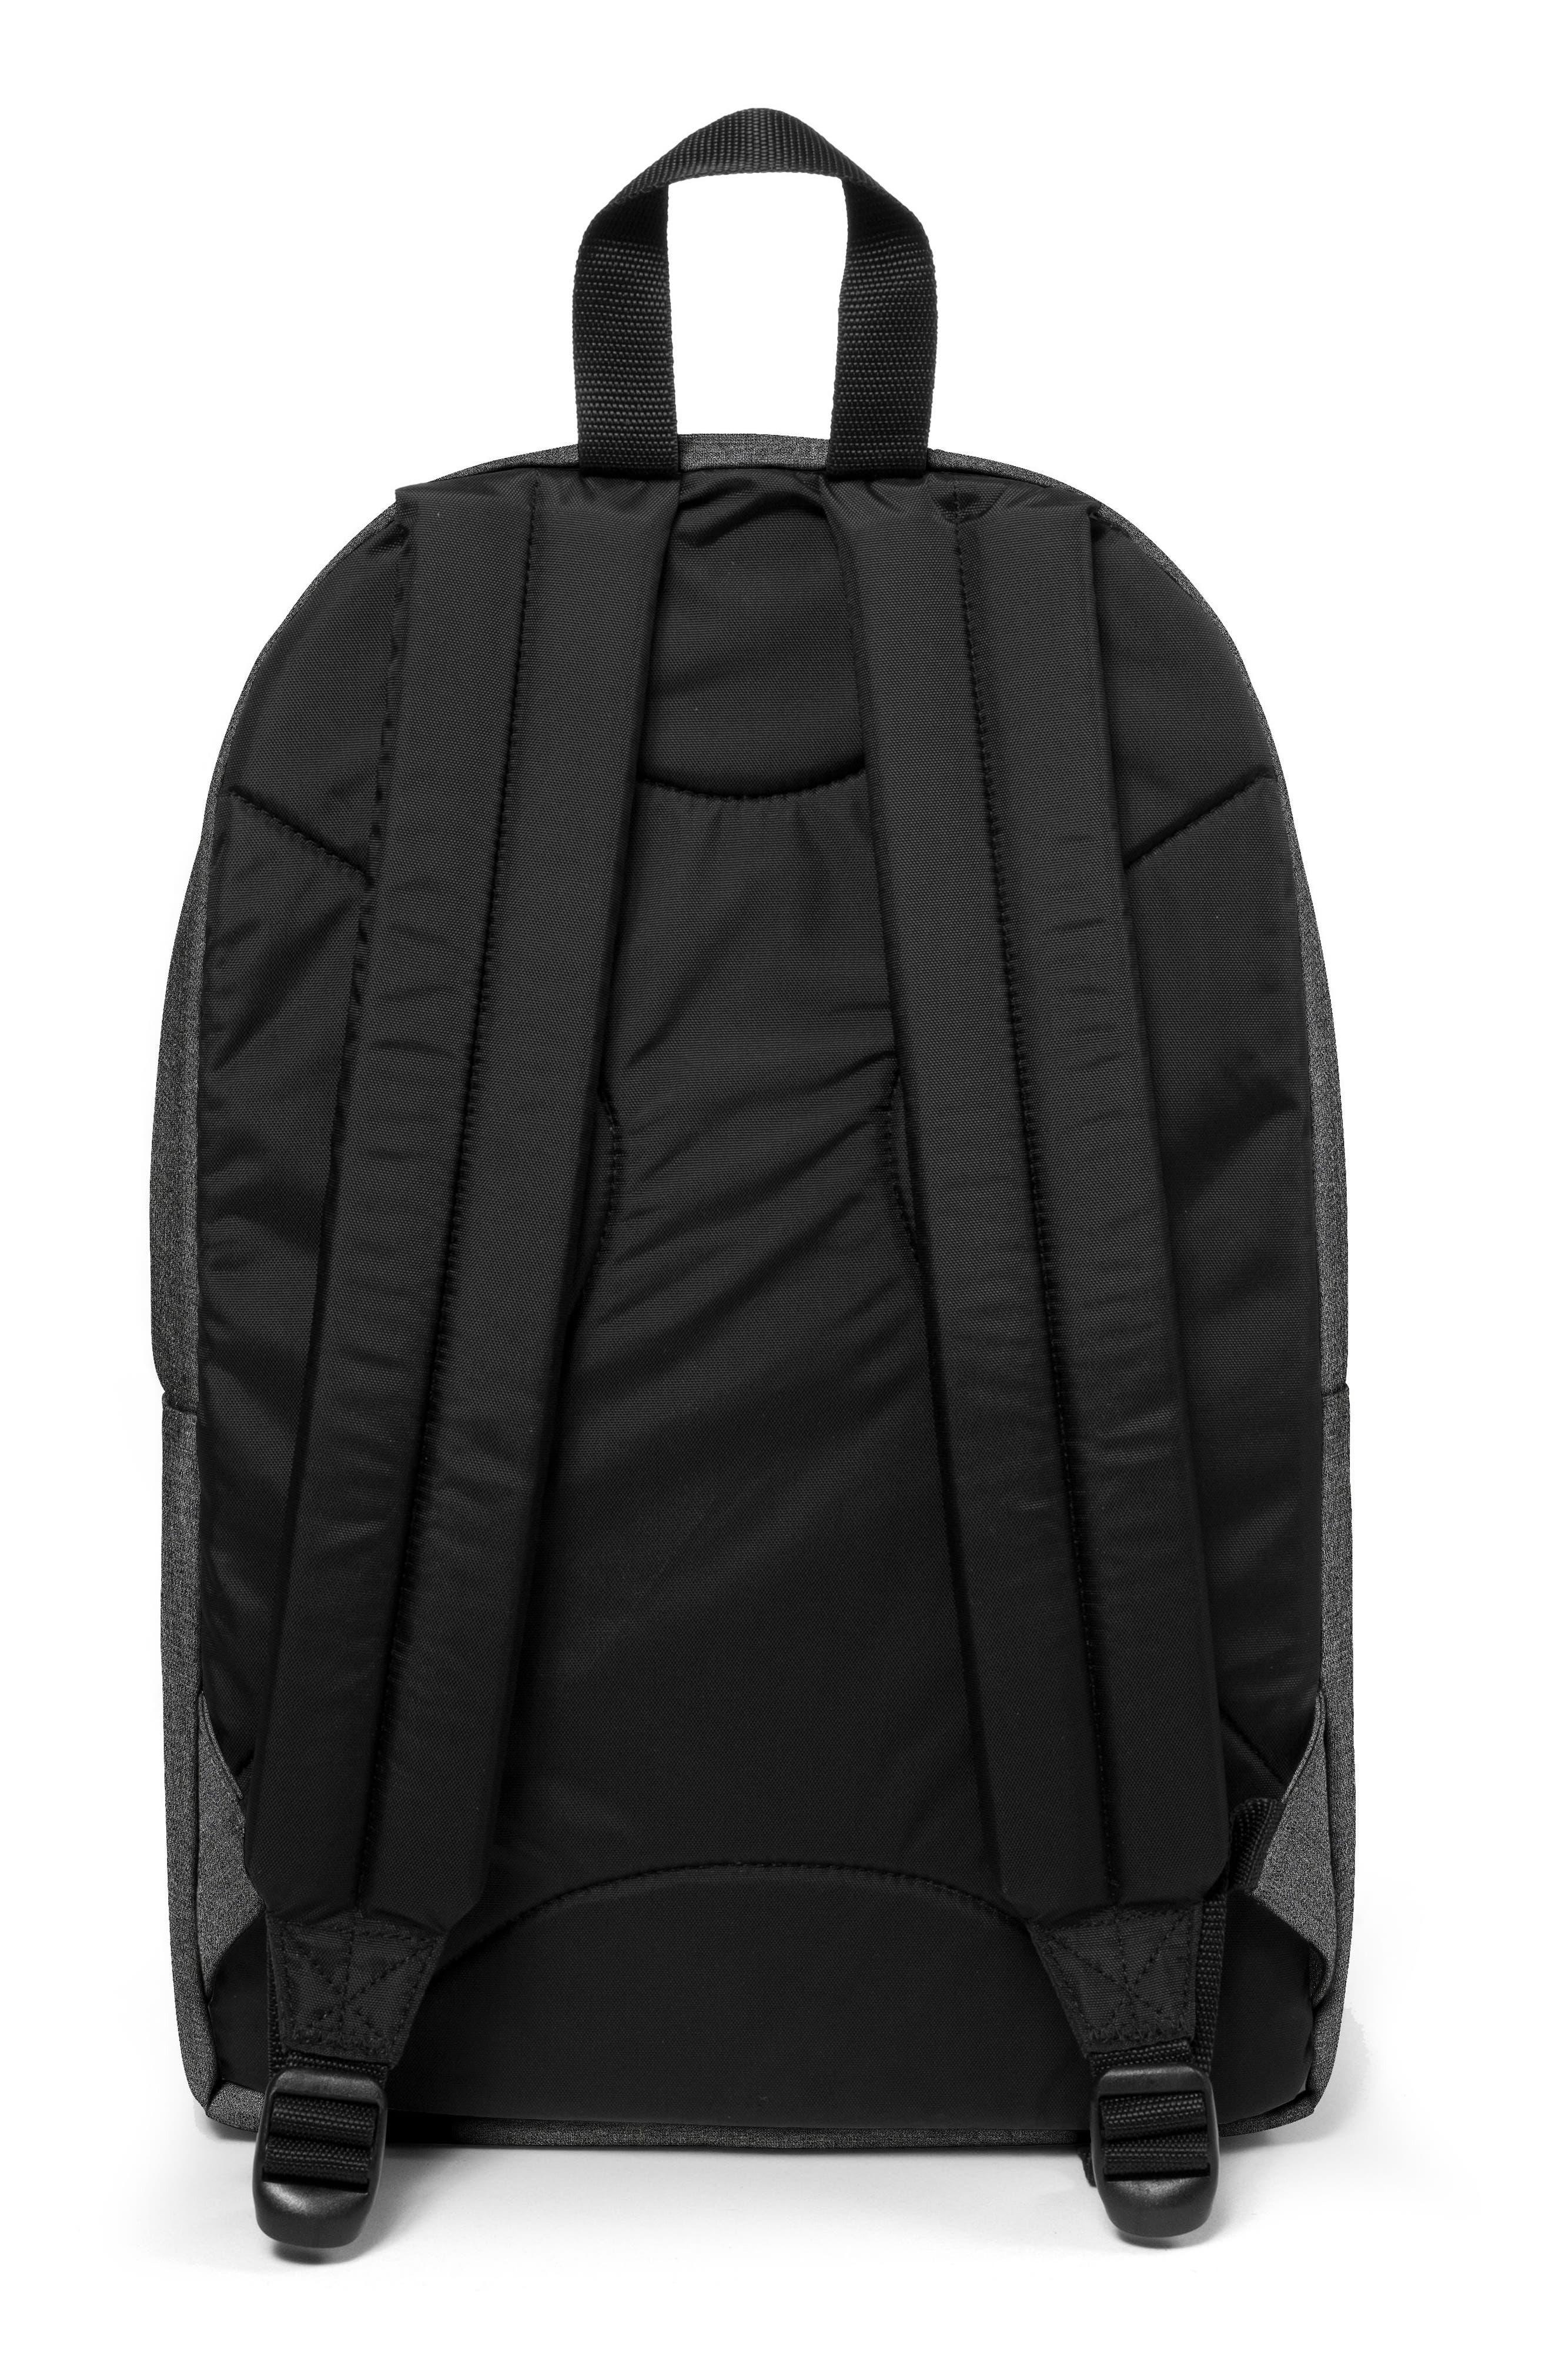 Back to Work Backpack,                             Alternate thumbnail 3, color,                             BLACK DENIM